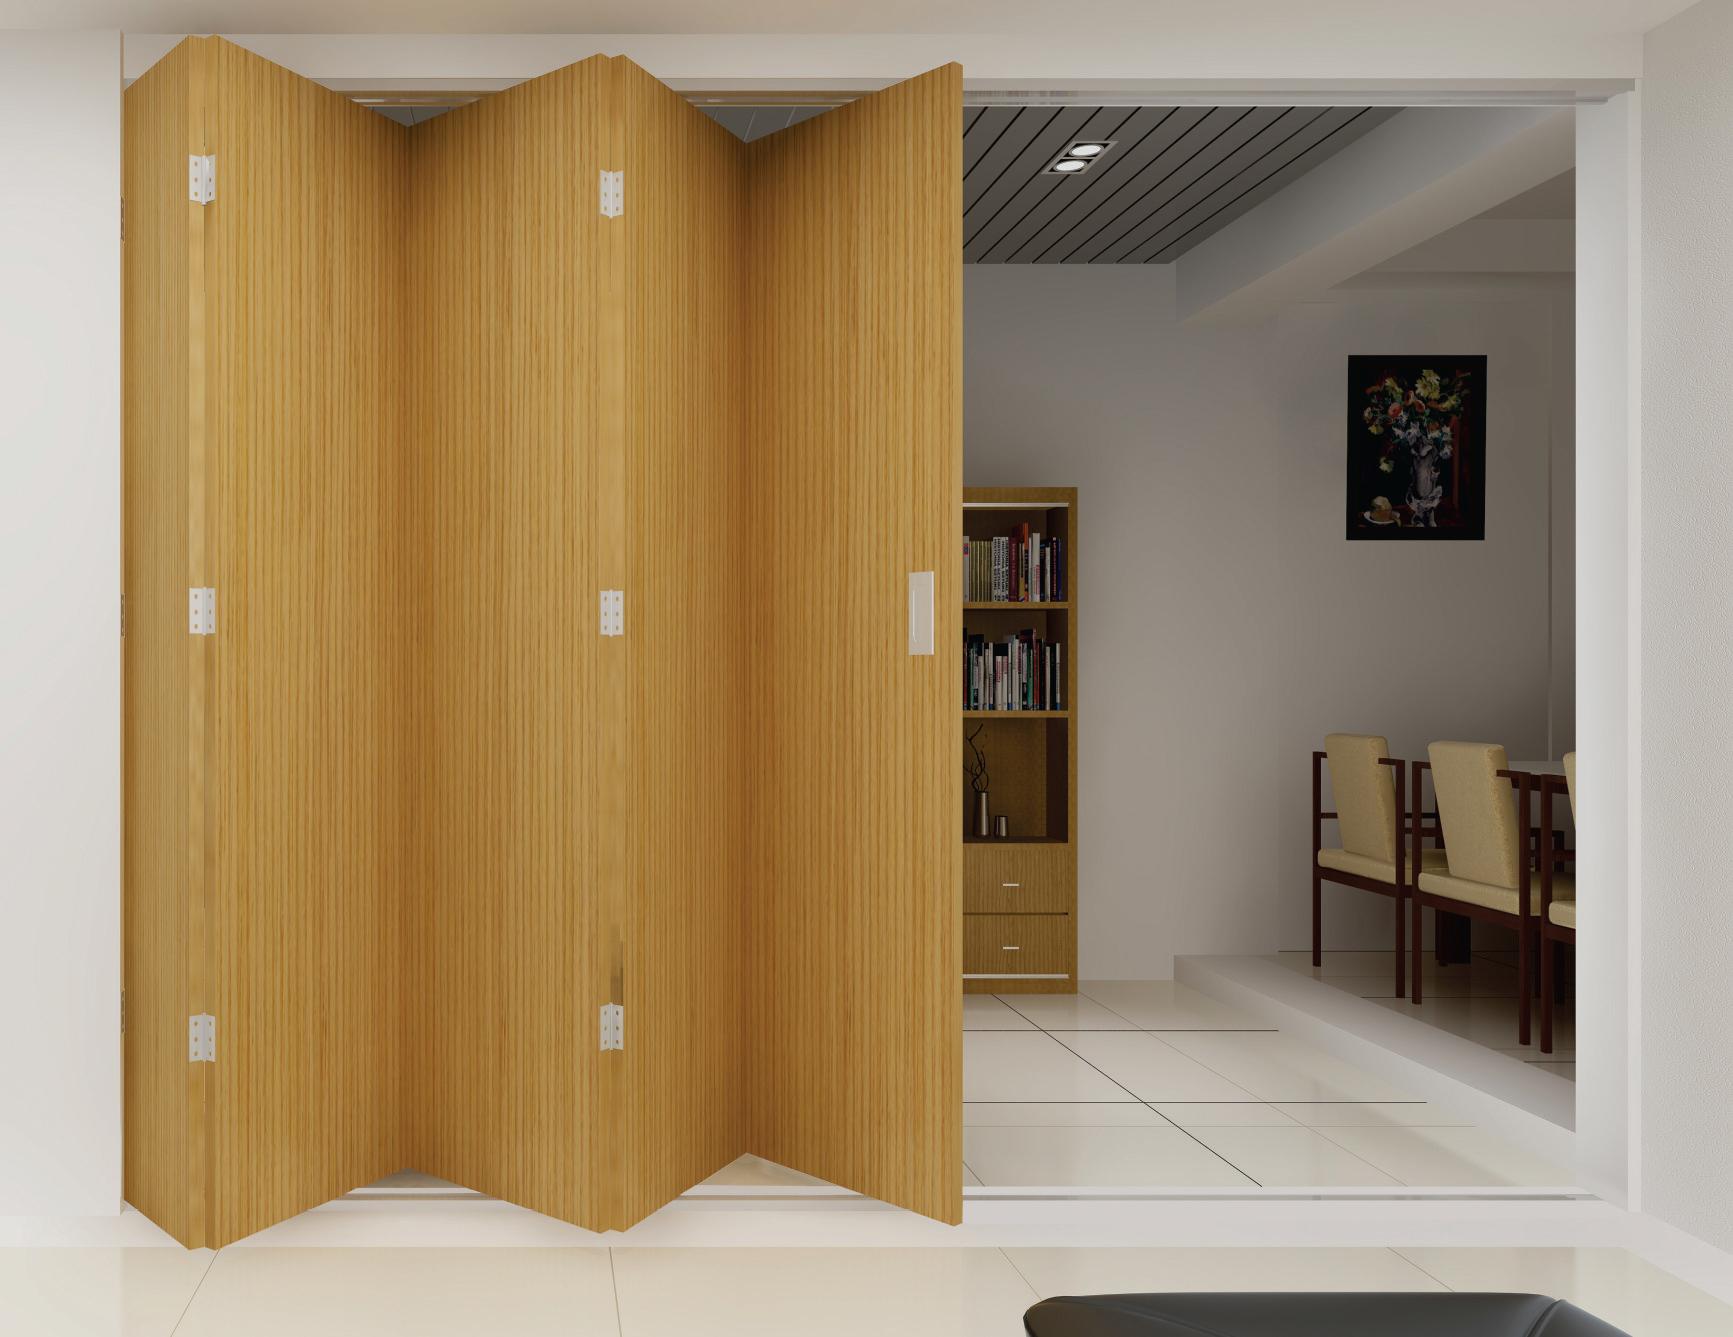 hafele doors hafele installation guide soft closing sliding hardware eku youtube. Black Bedroom Furniture Sets. Home Design Ideas